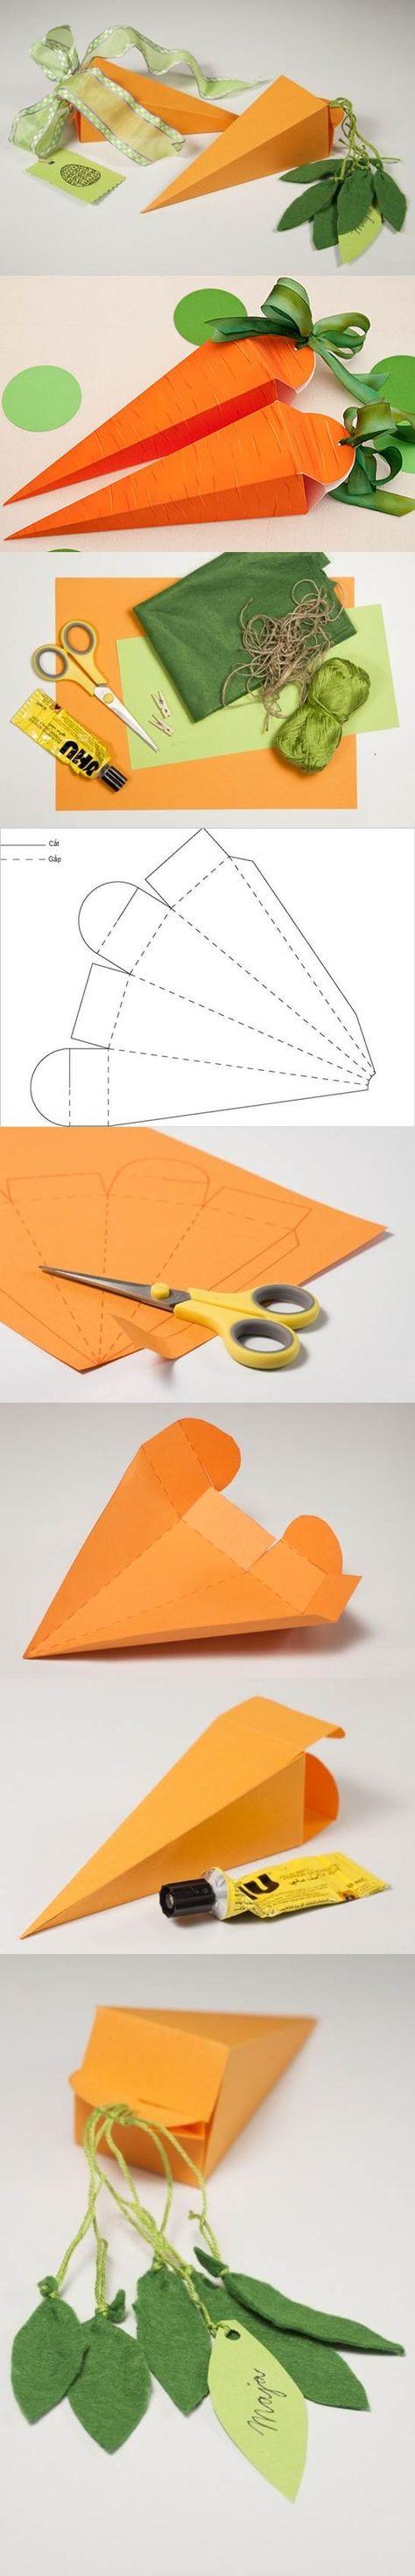 DIY Cute Carrot Shaped Gift Box | iCreativeIdeas.com Like Us on Facebook ==> https://www.facebook.com/icreativeideas